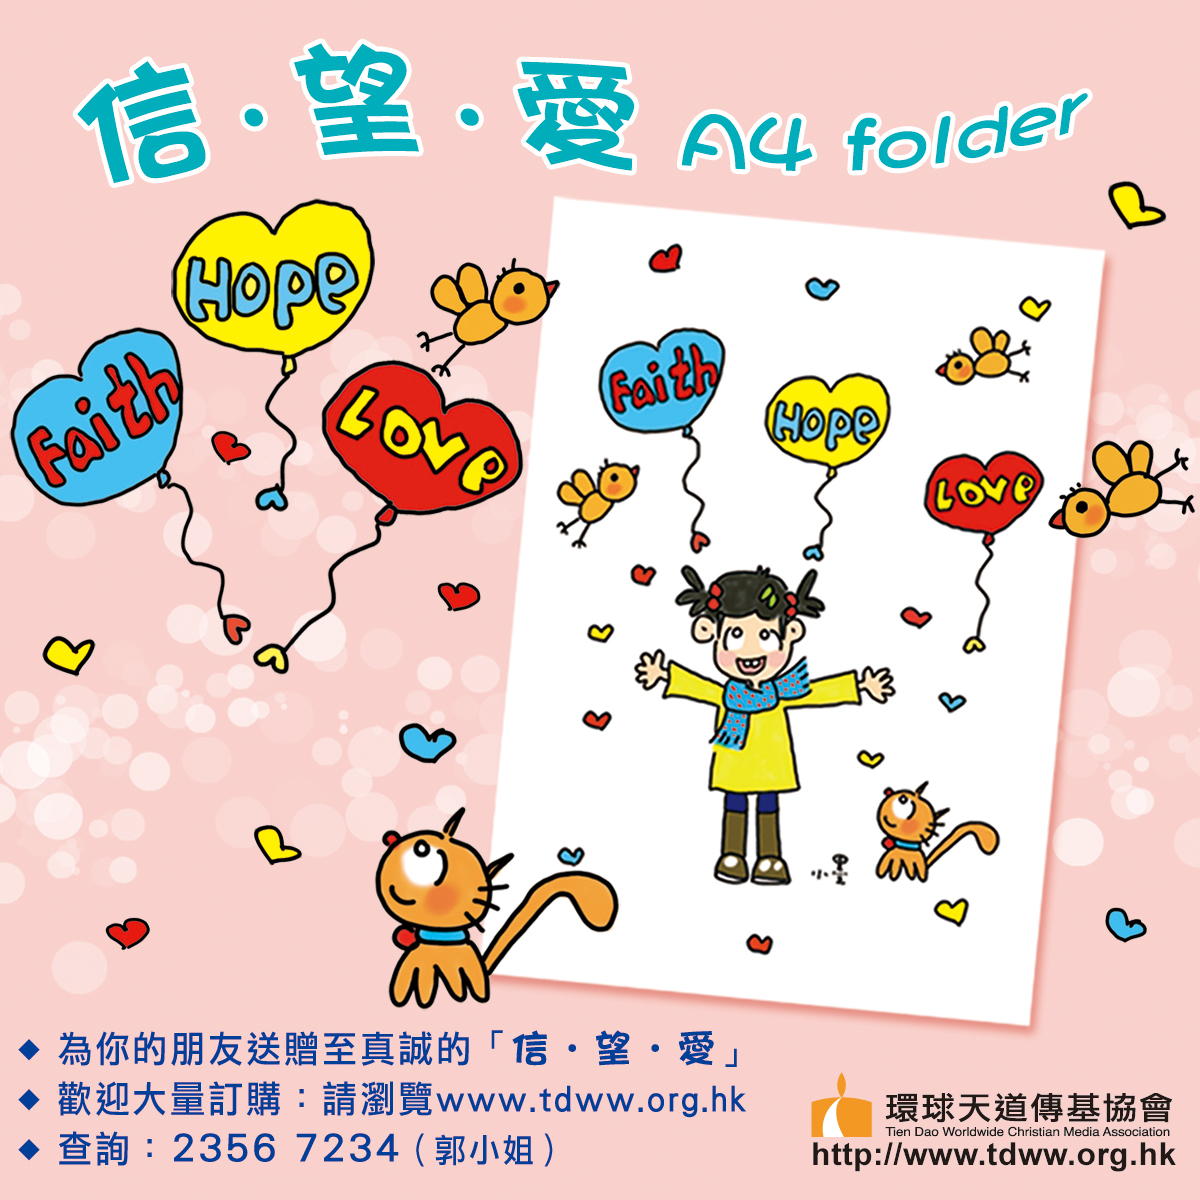 Folder-1200x1200